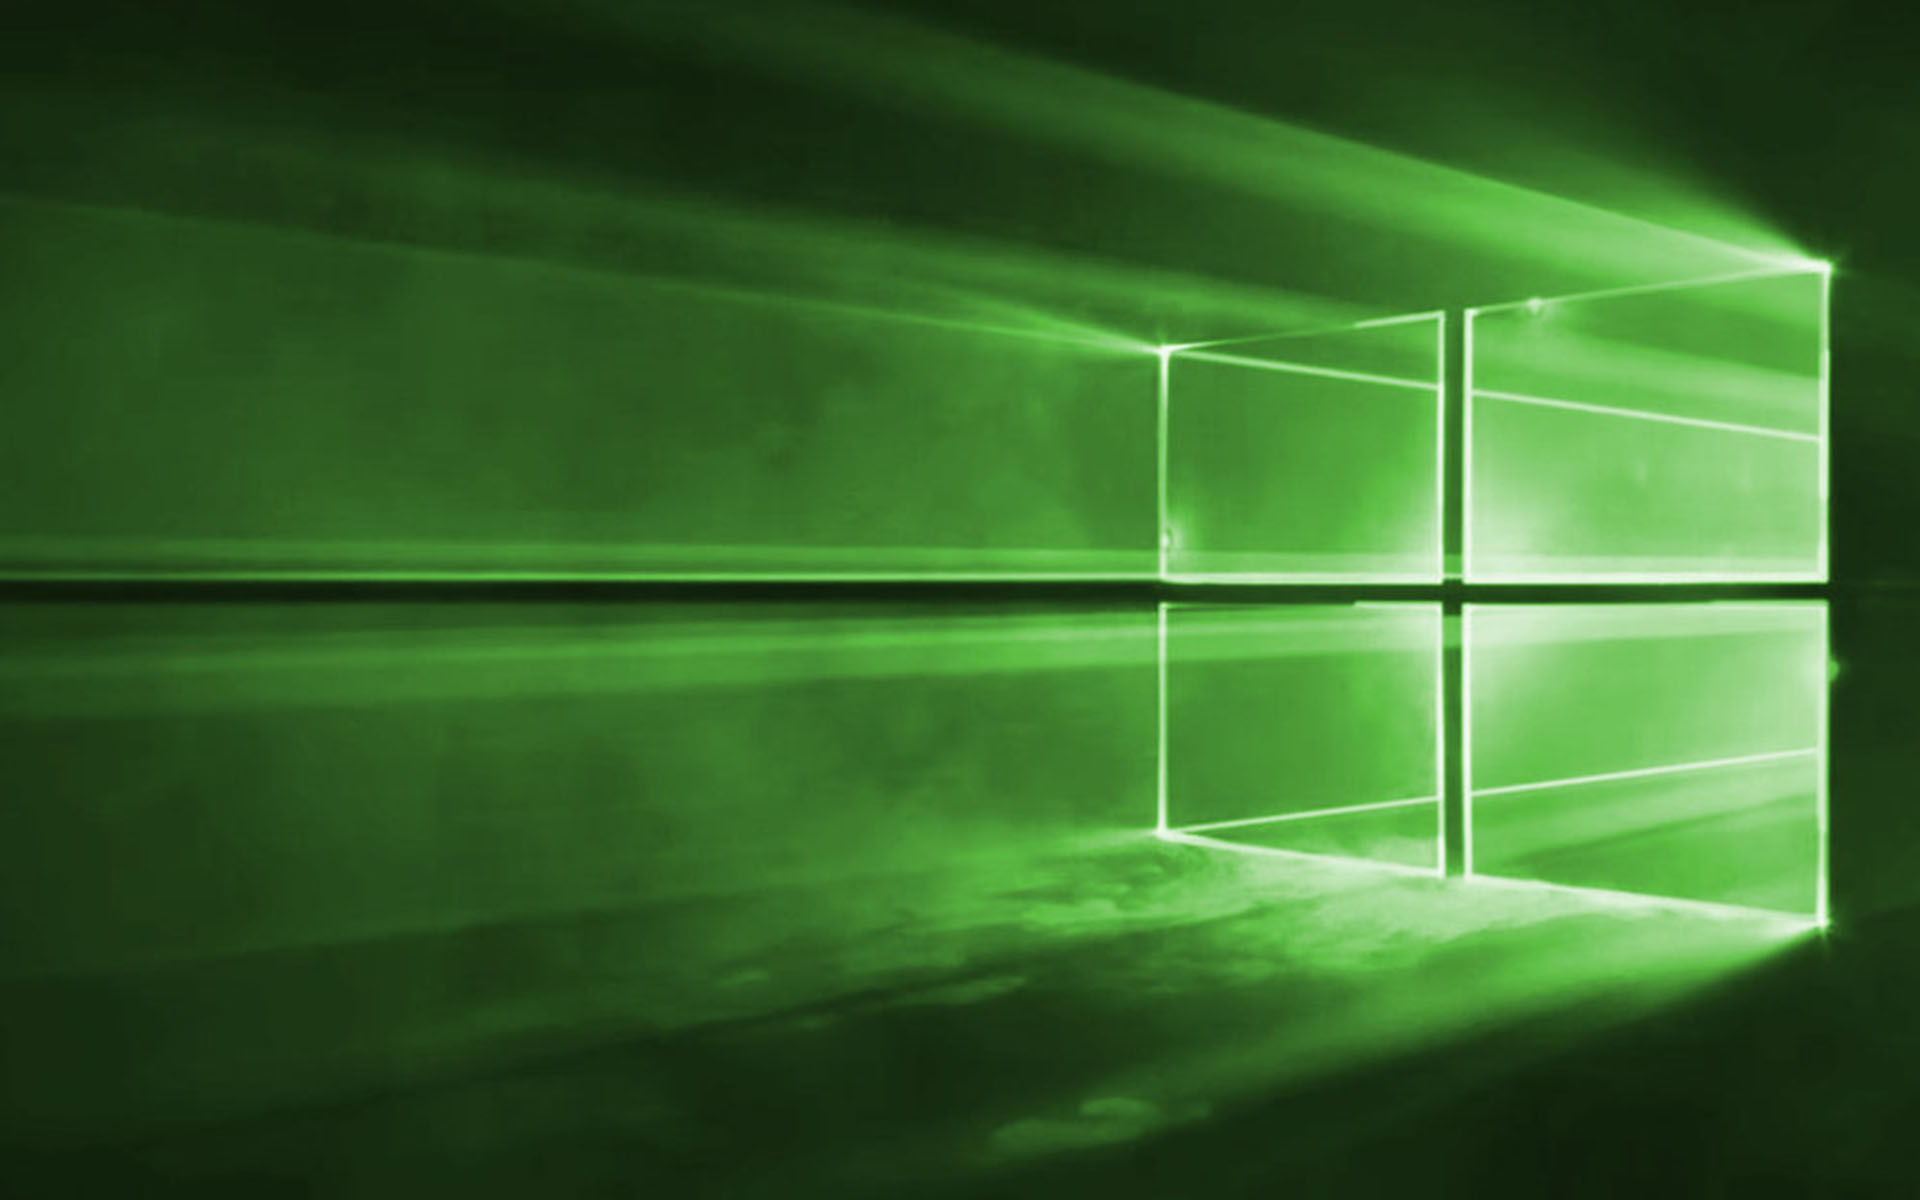 green windows 10 wallpaper wallpapers